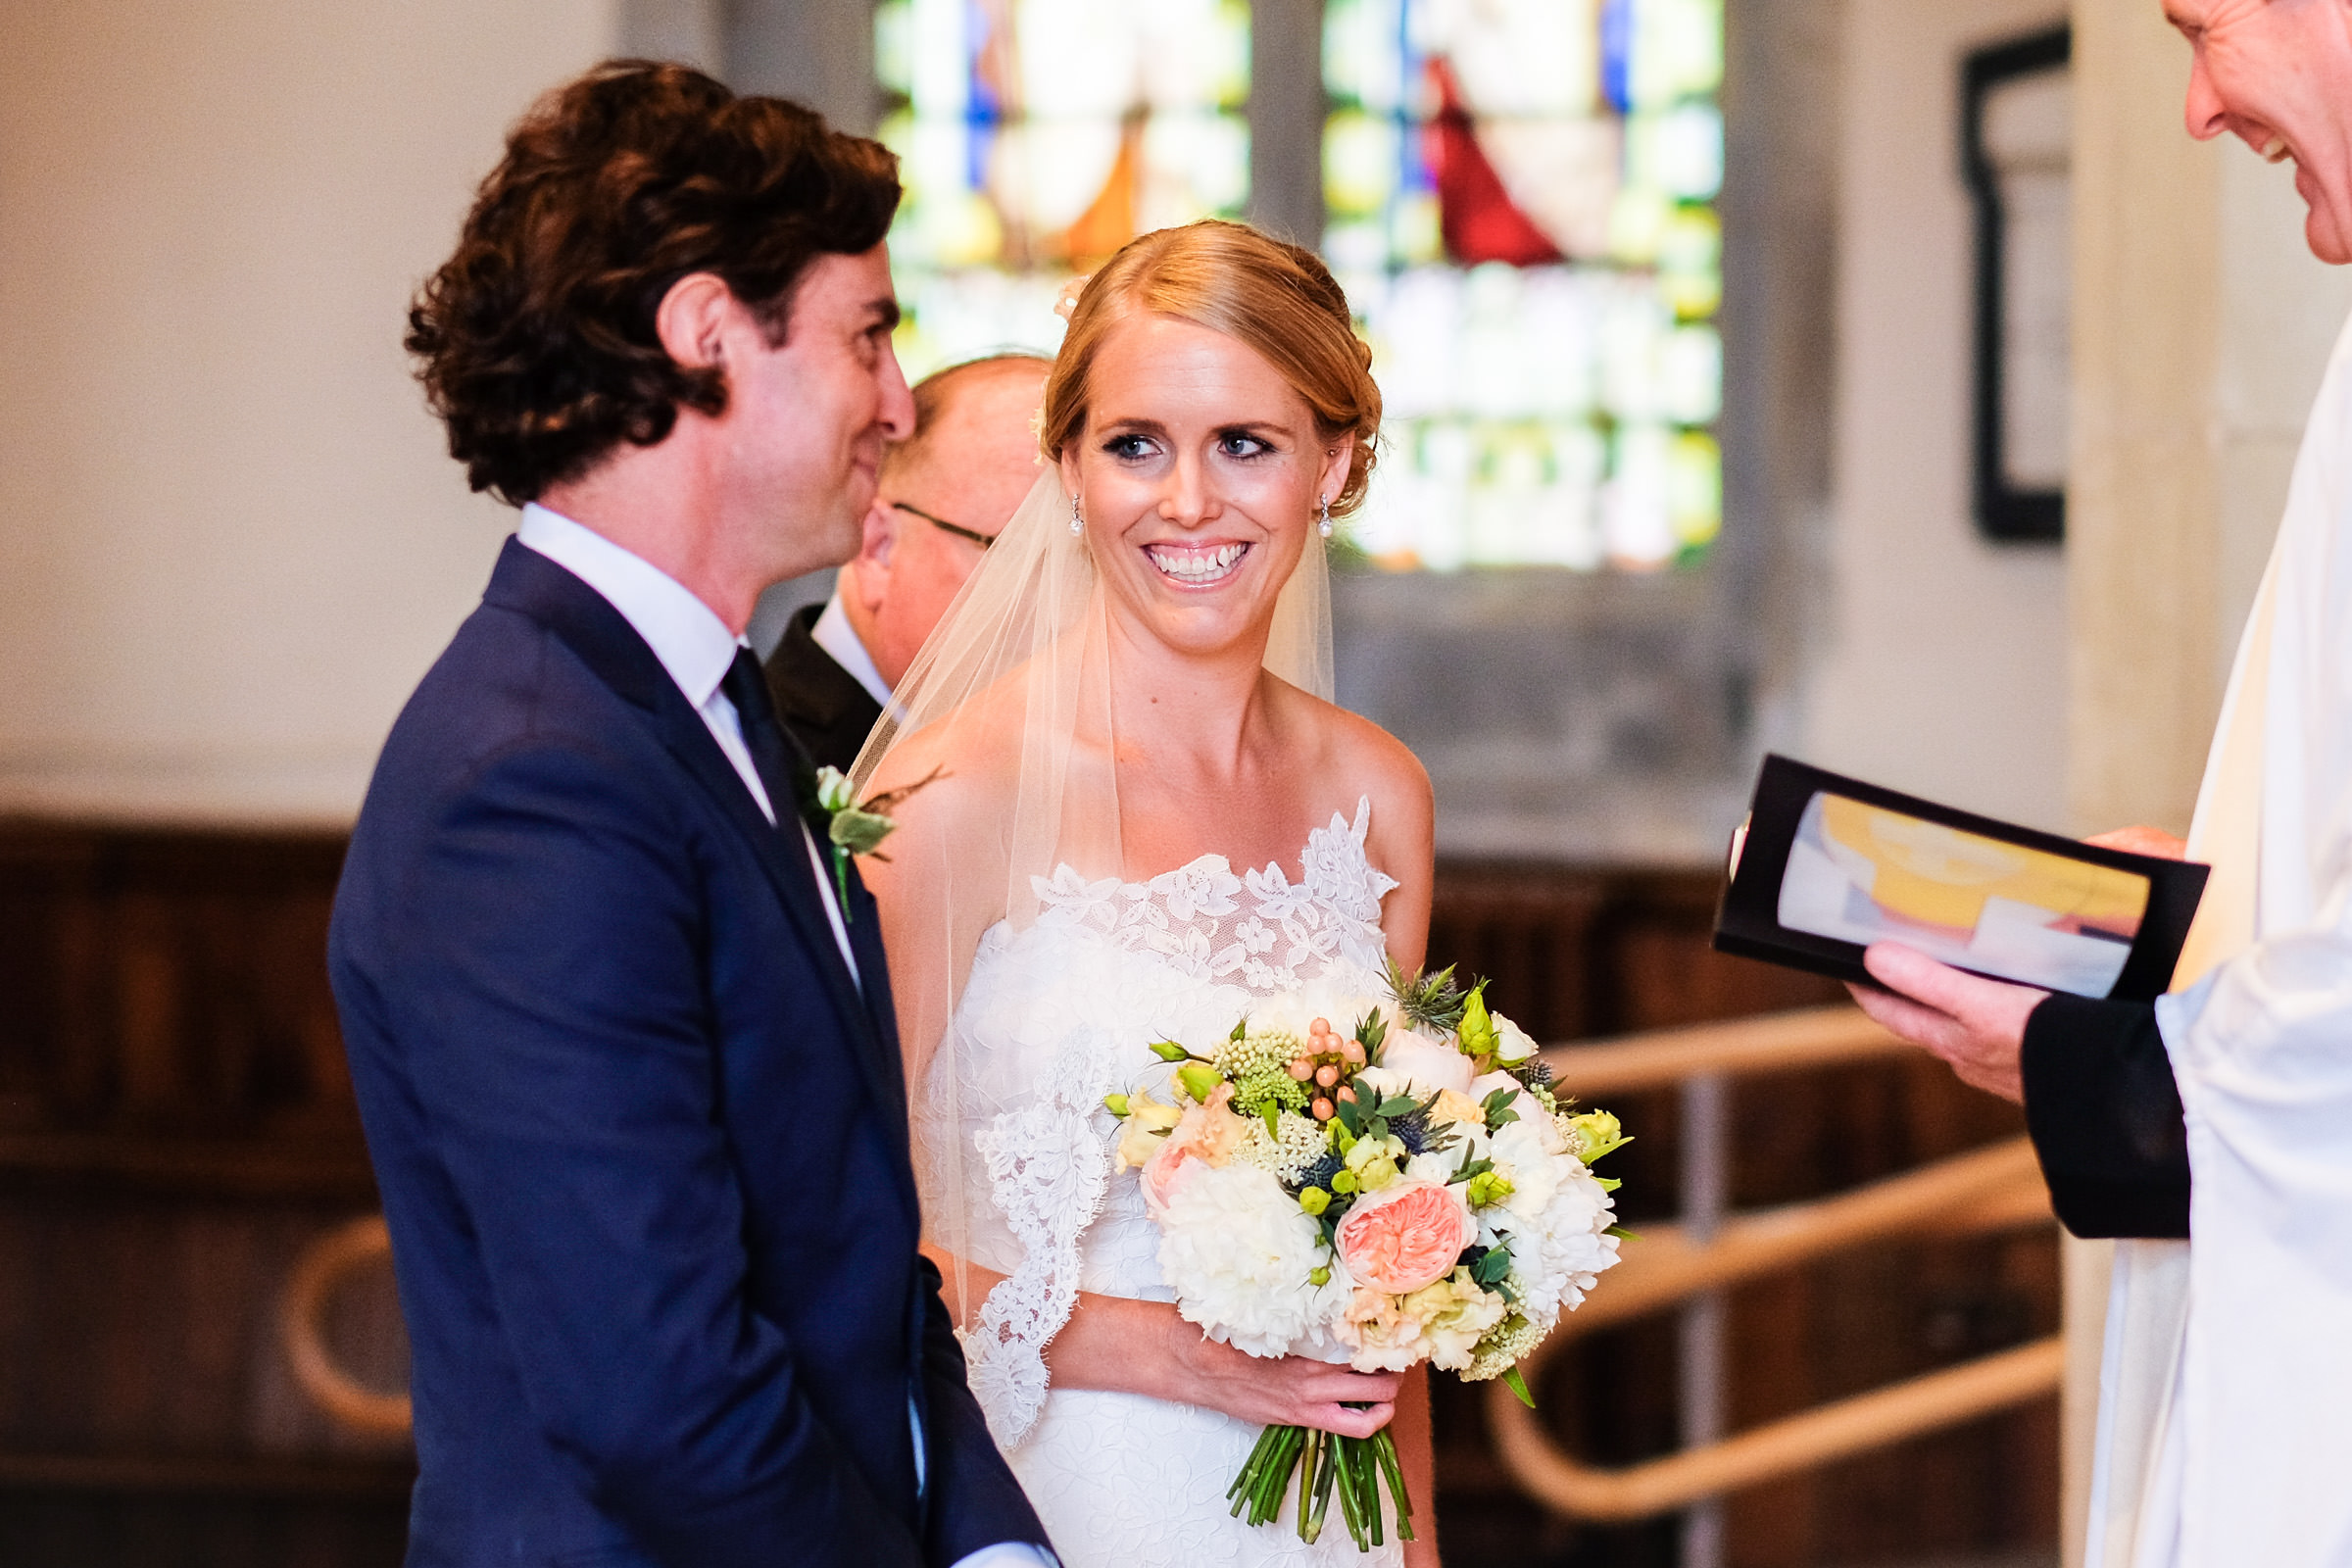 Wedding at St. Mary's Church in Surrey 010.jpg